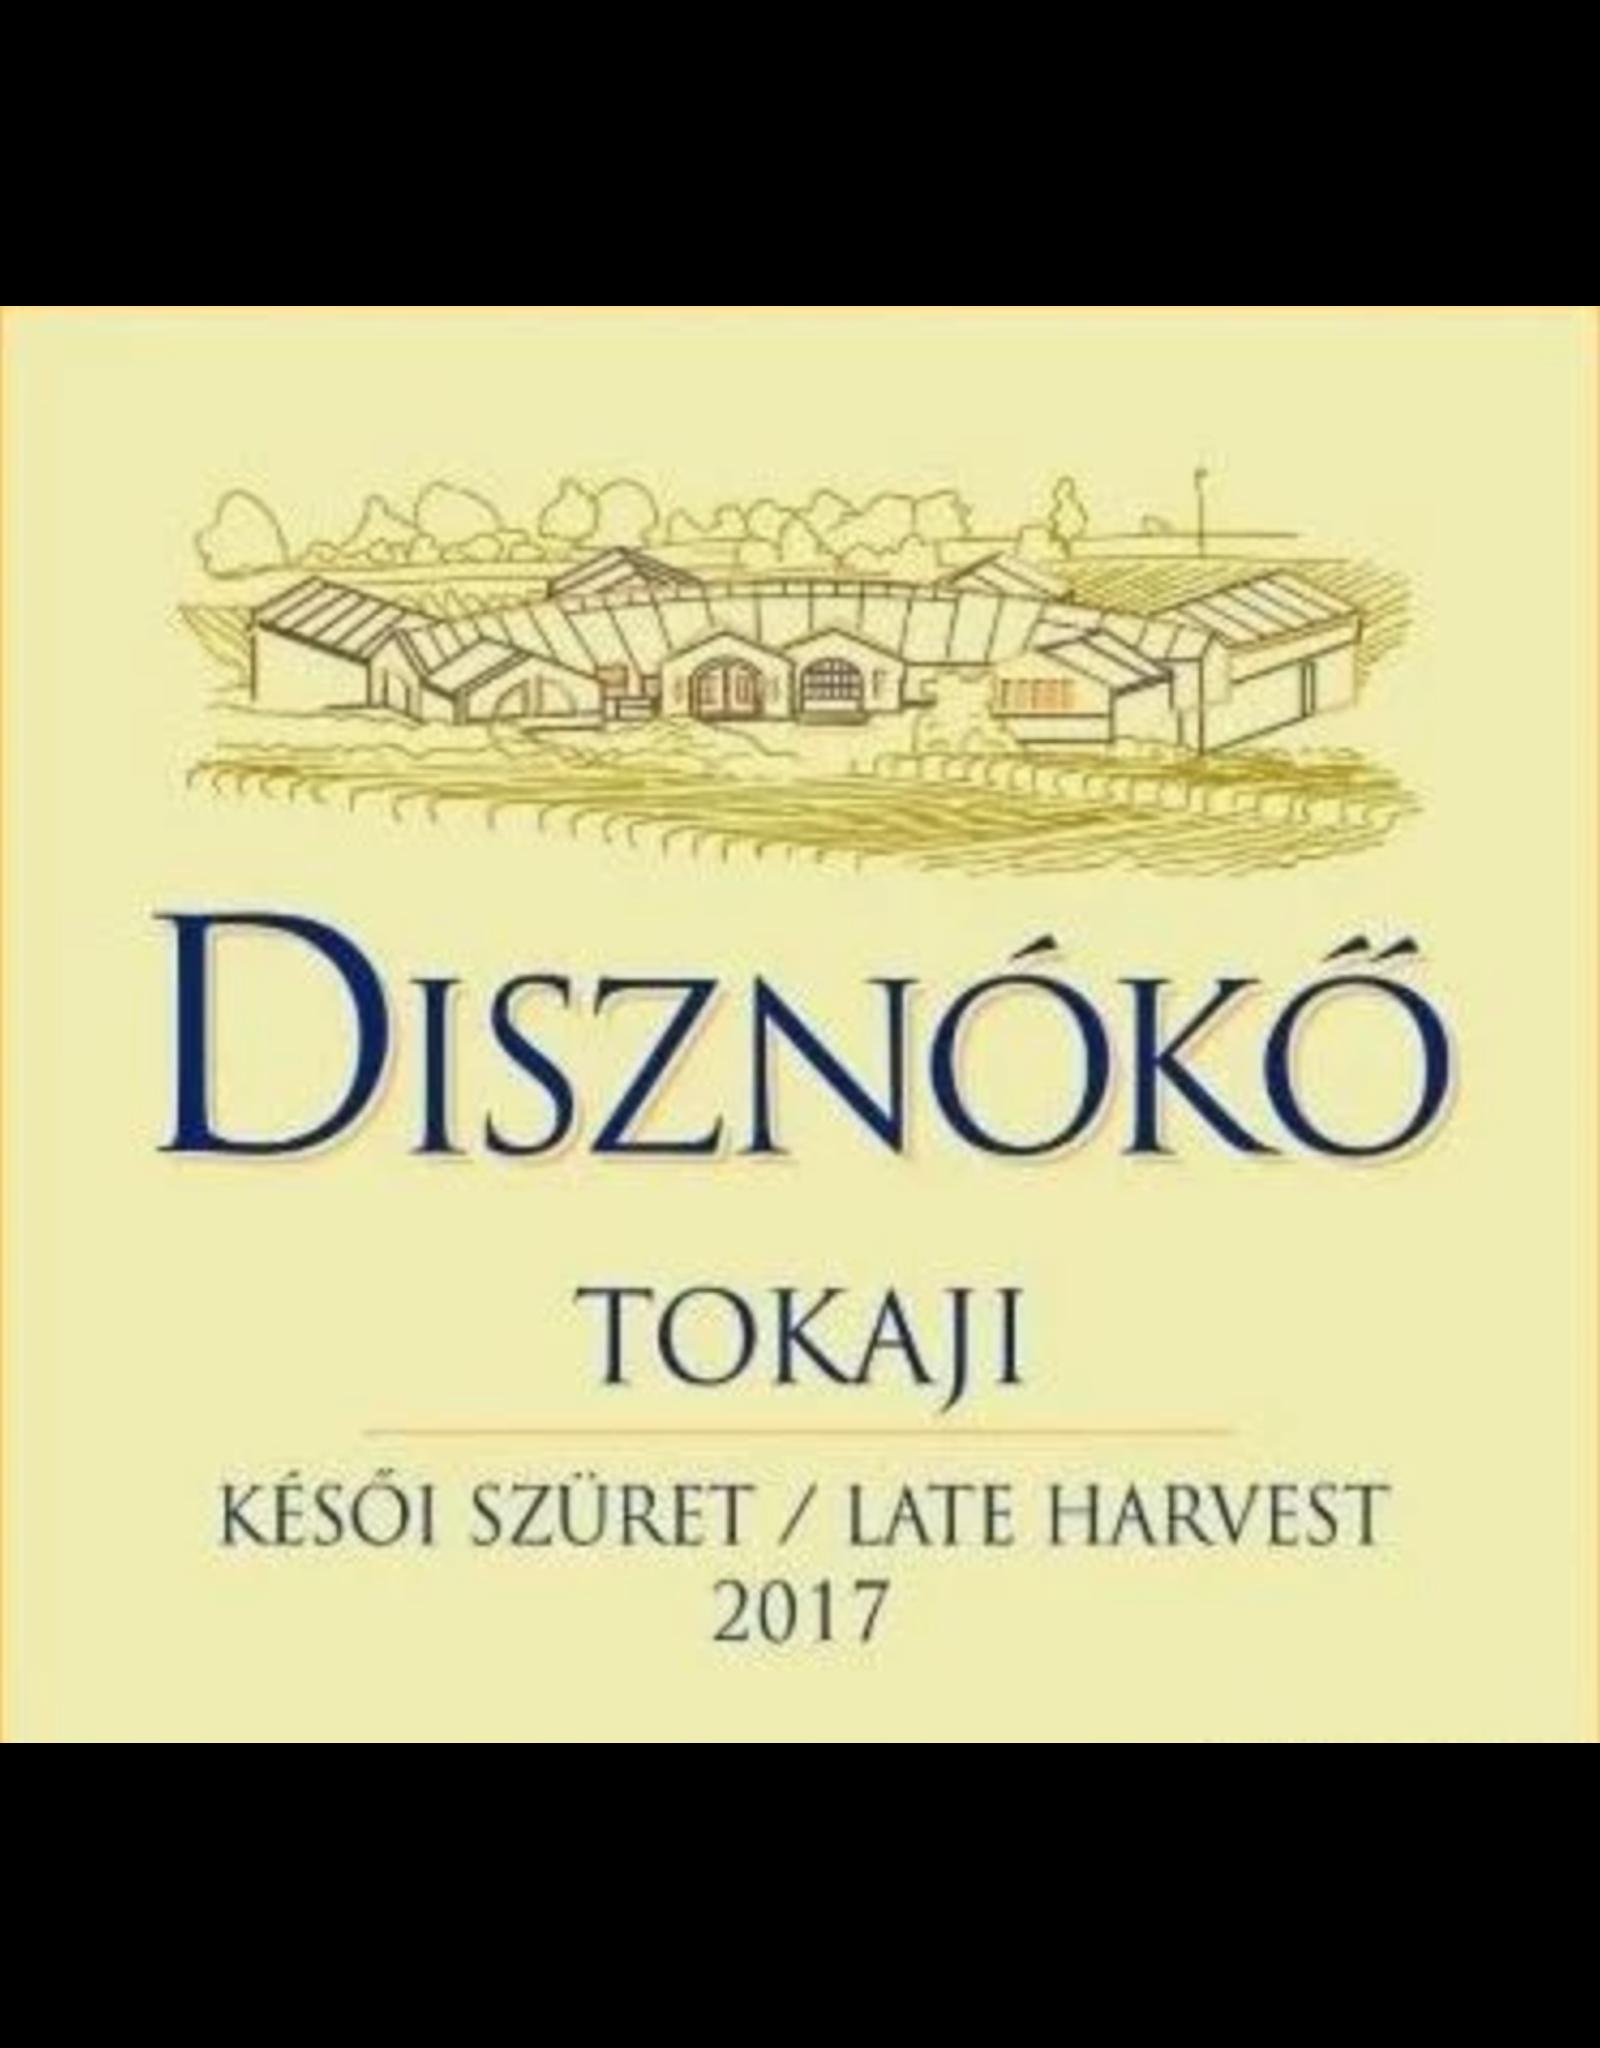 Disznoko Tokaji Late Harvest 2017